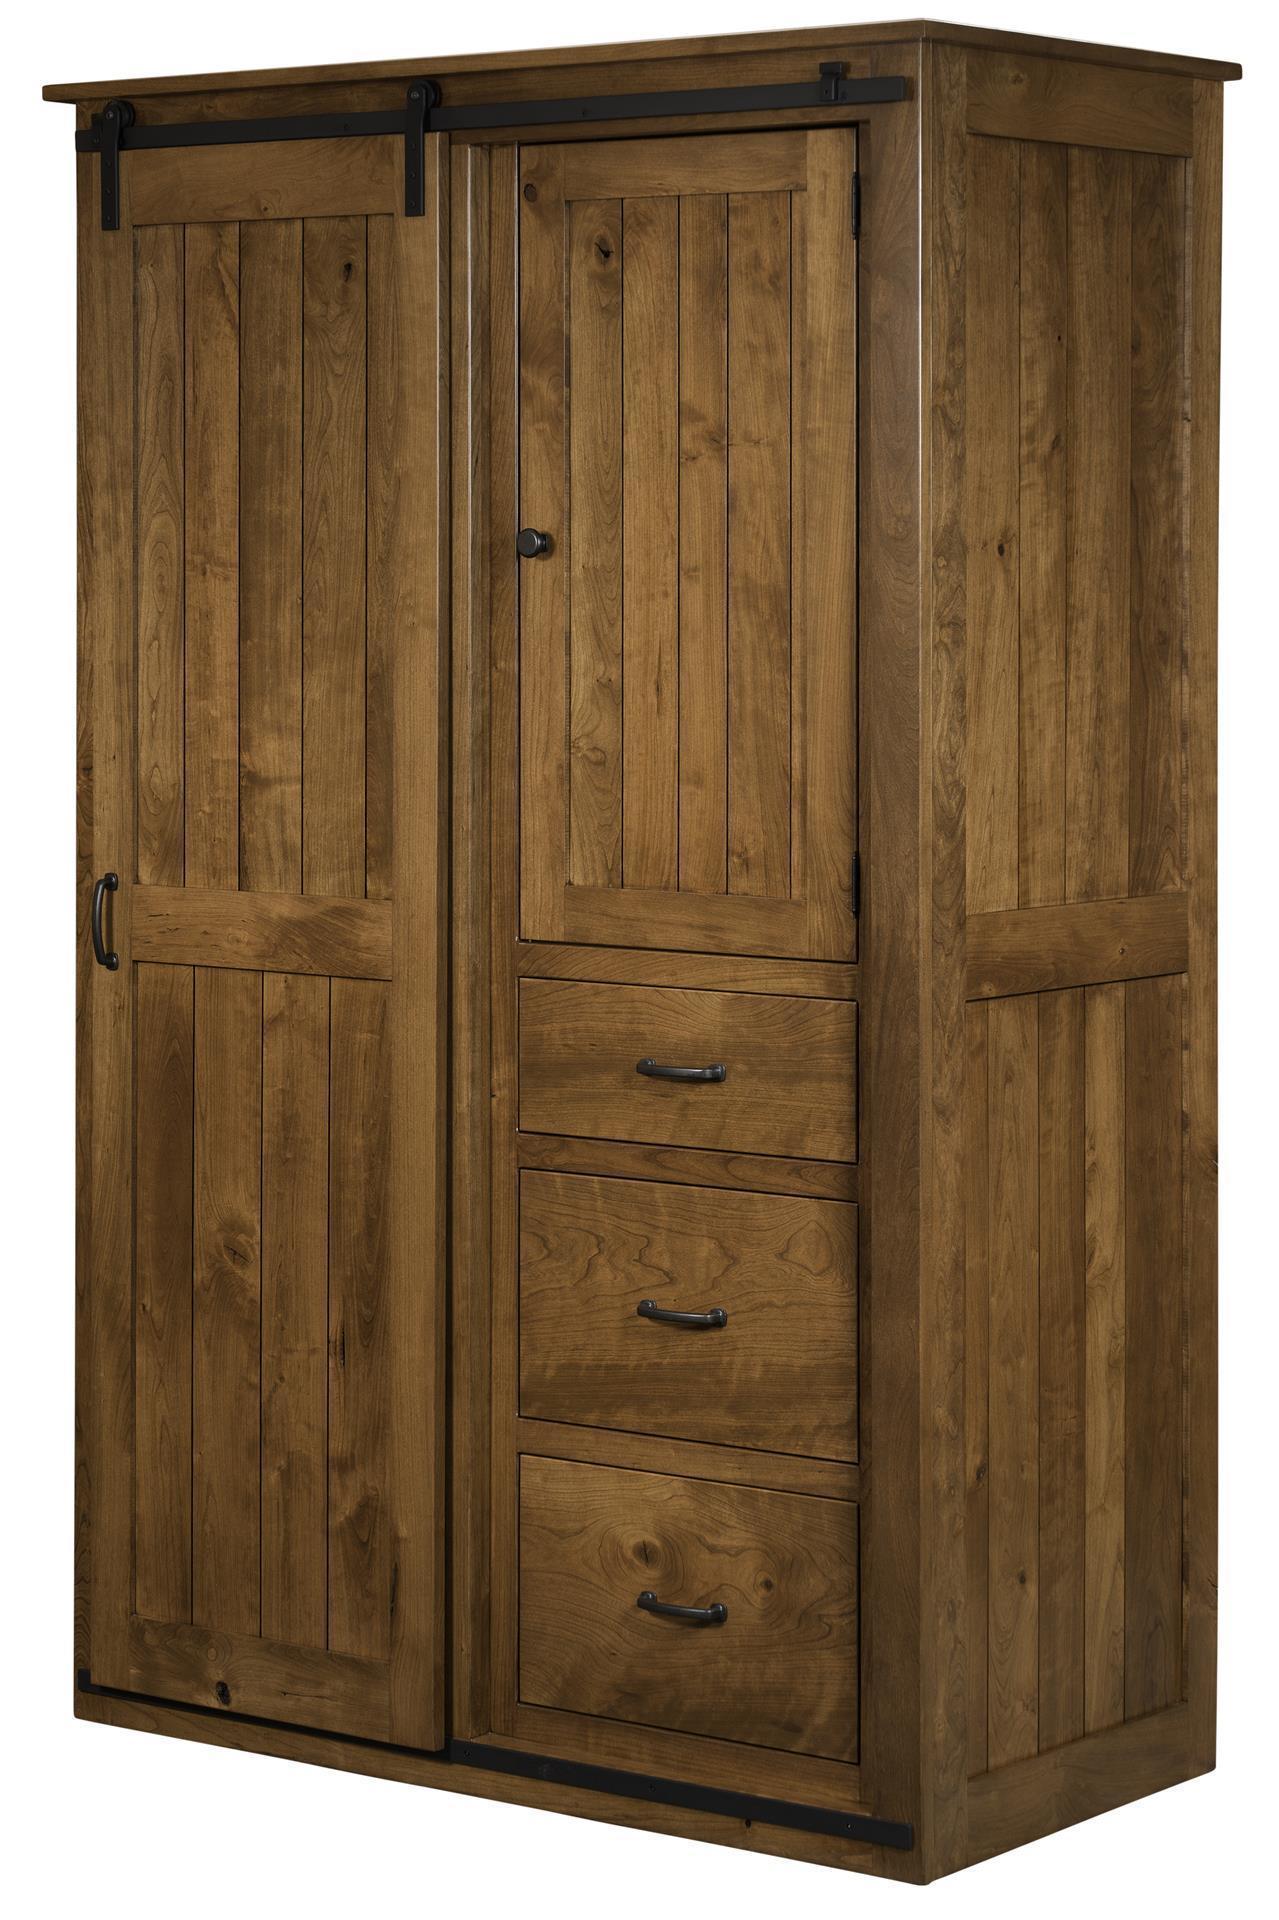 Sliding Barn Door Wardrobe Cabinet From Dutchcrafters